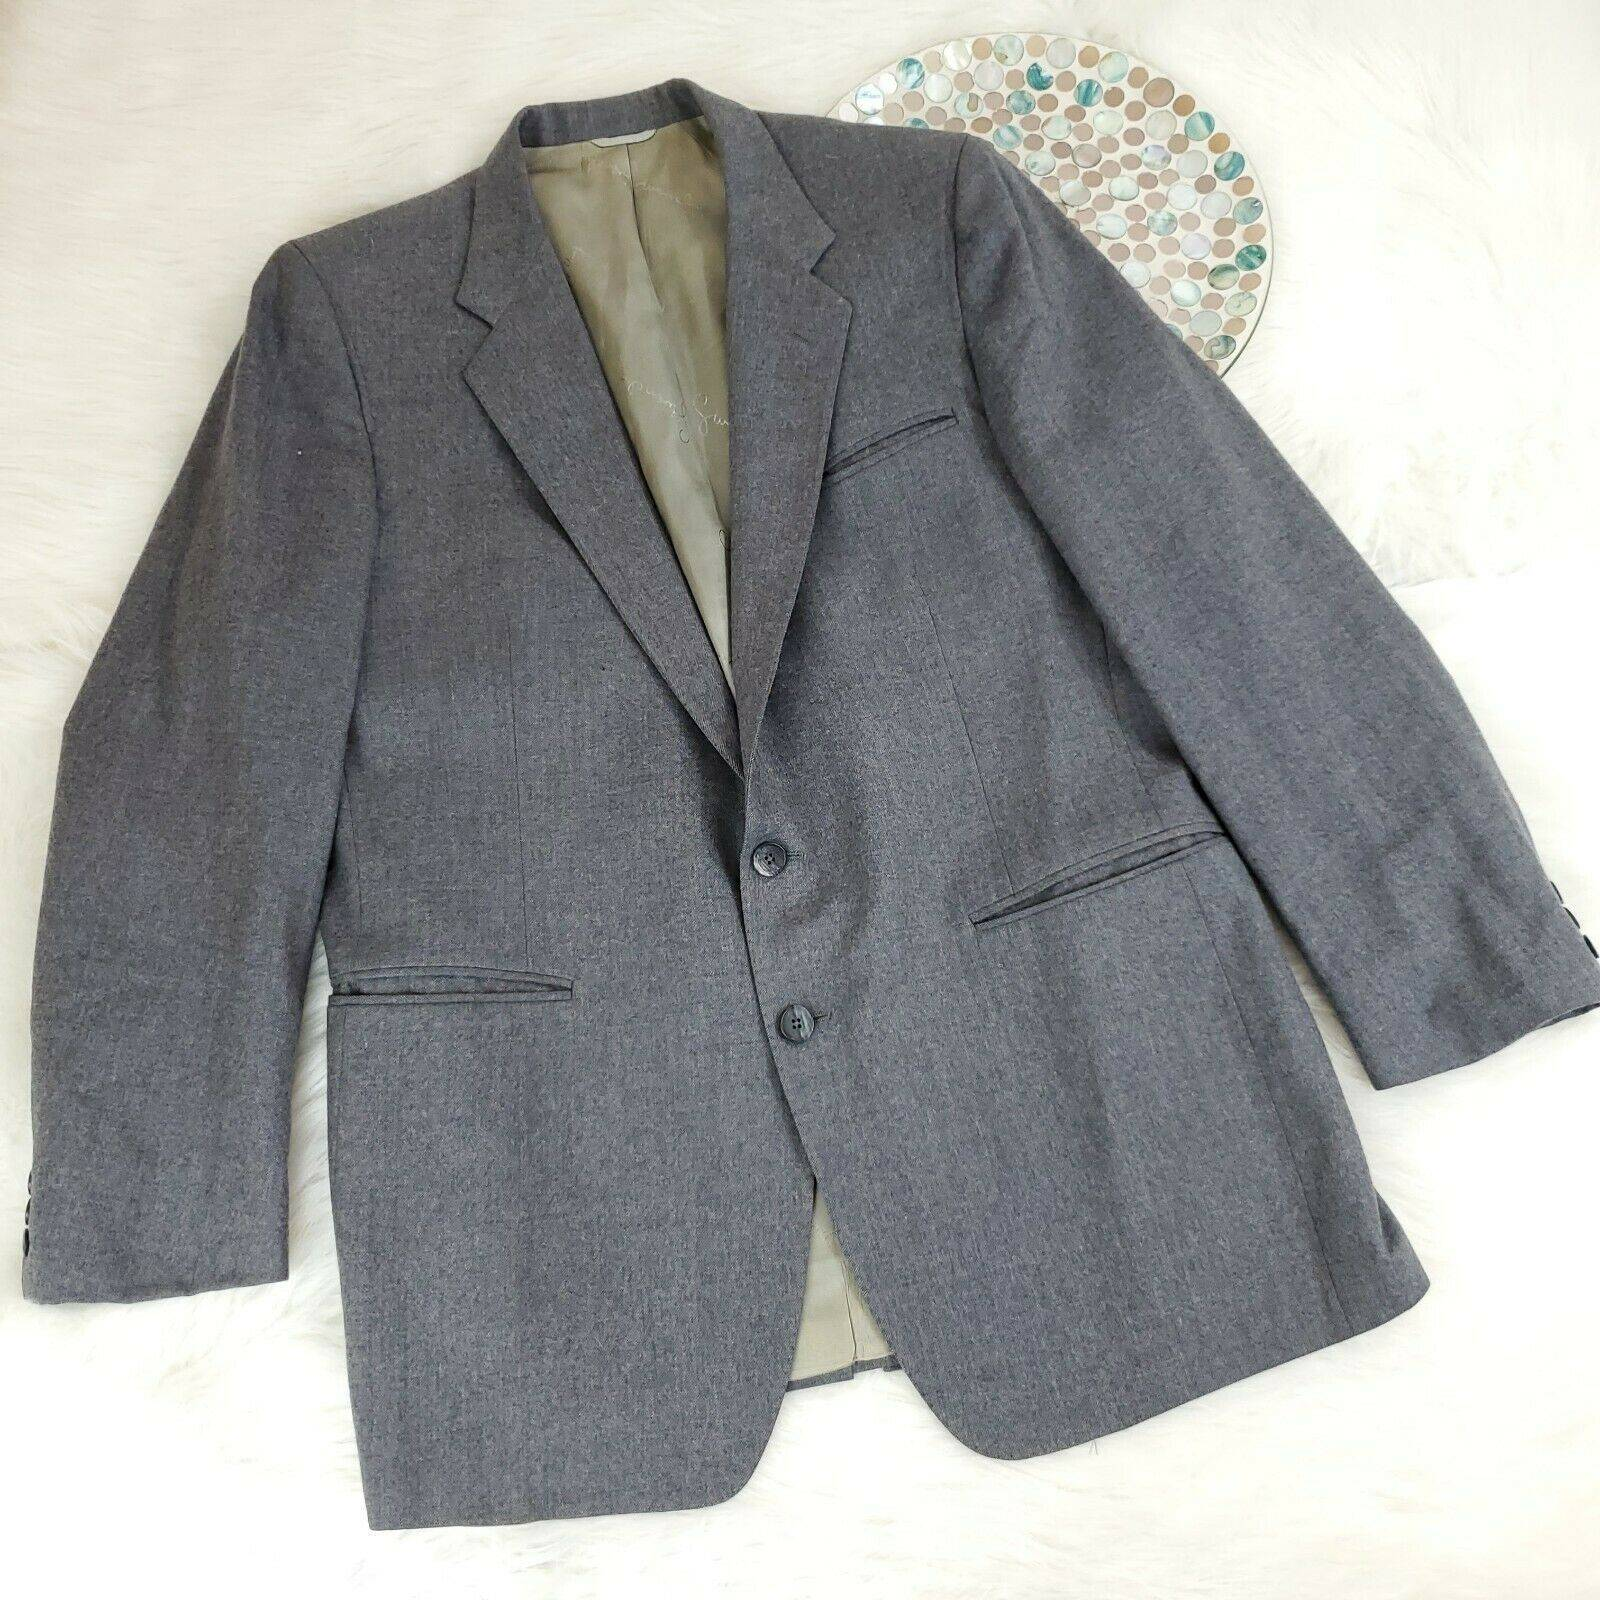 Givenchy Gentleman Blazer Suit Jacket